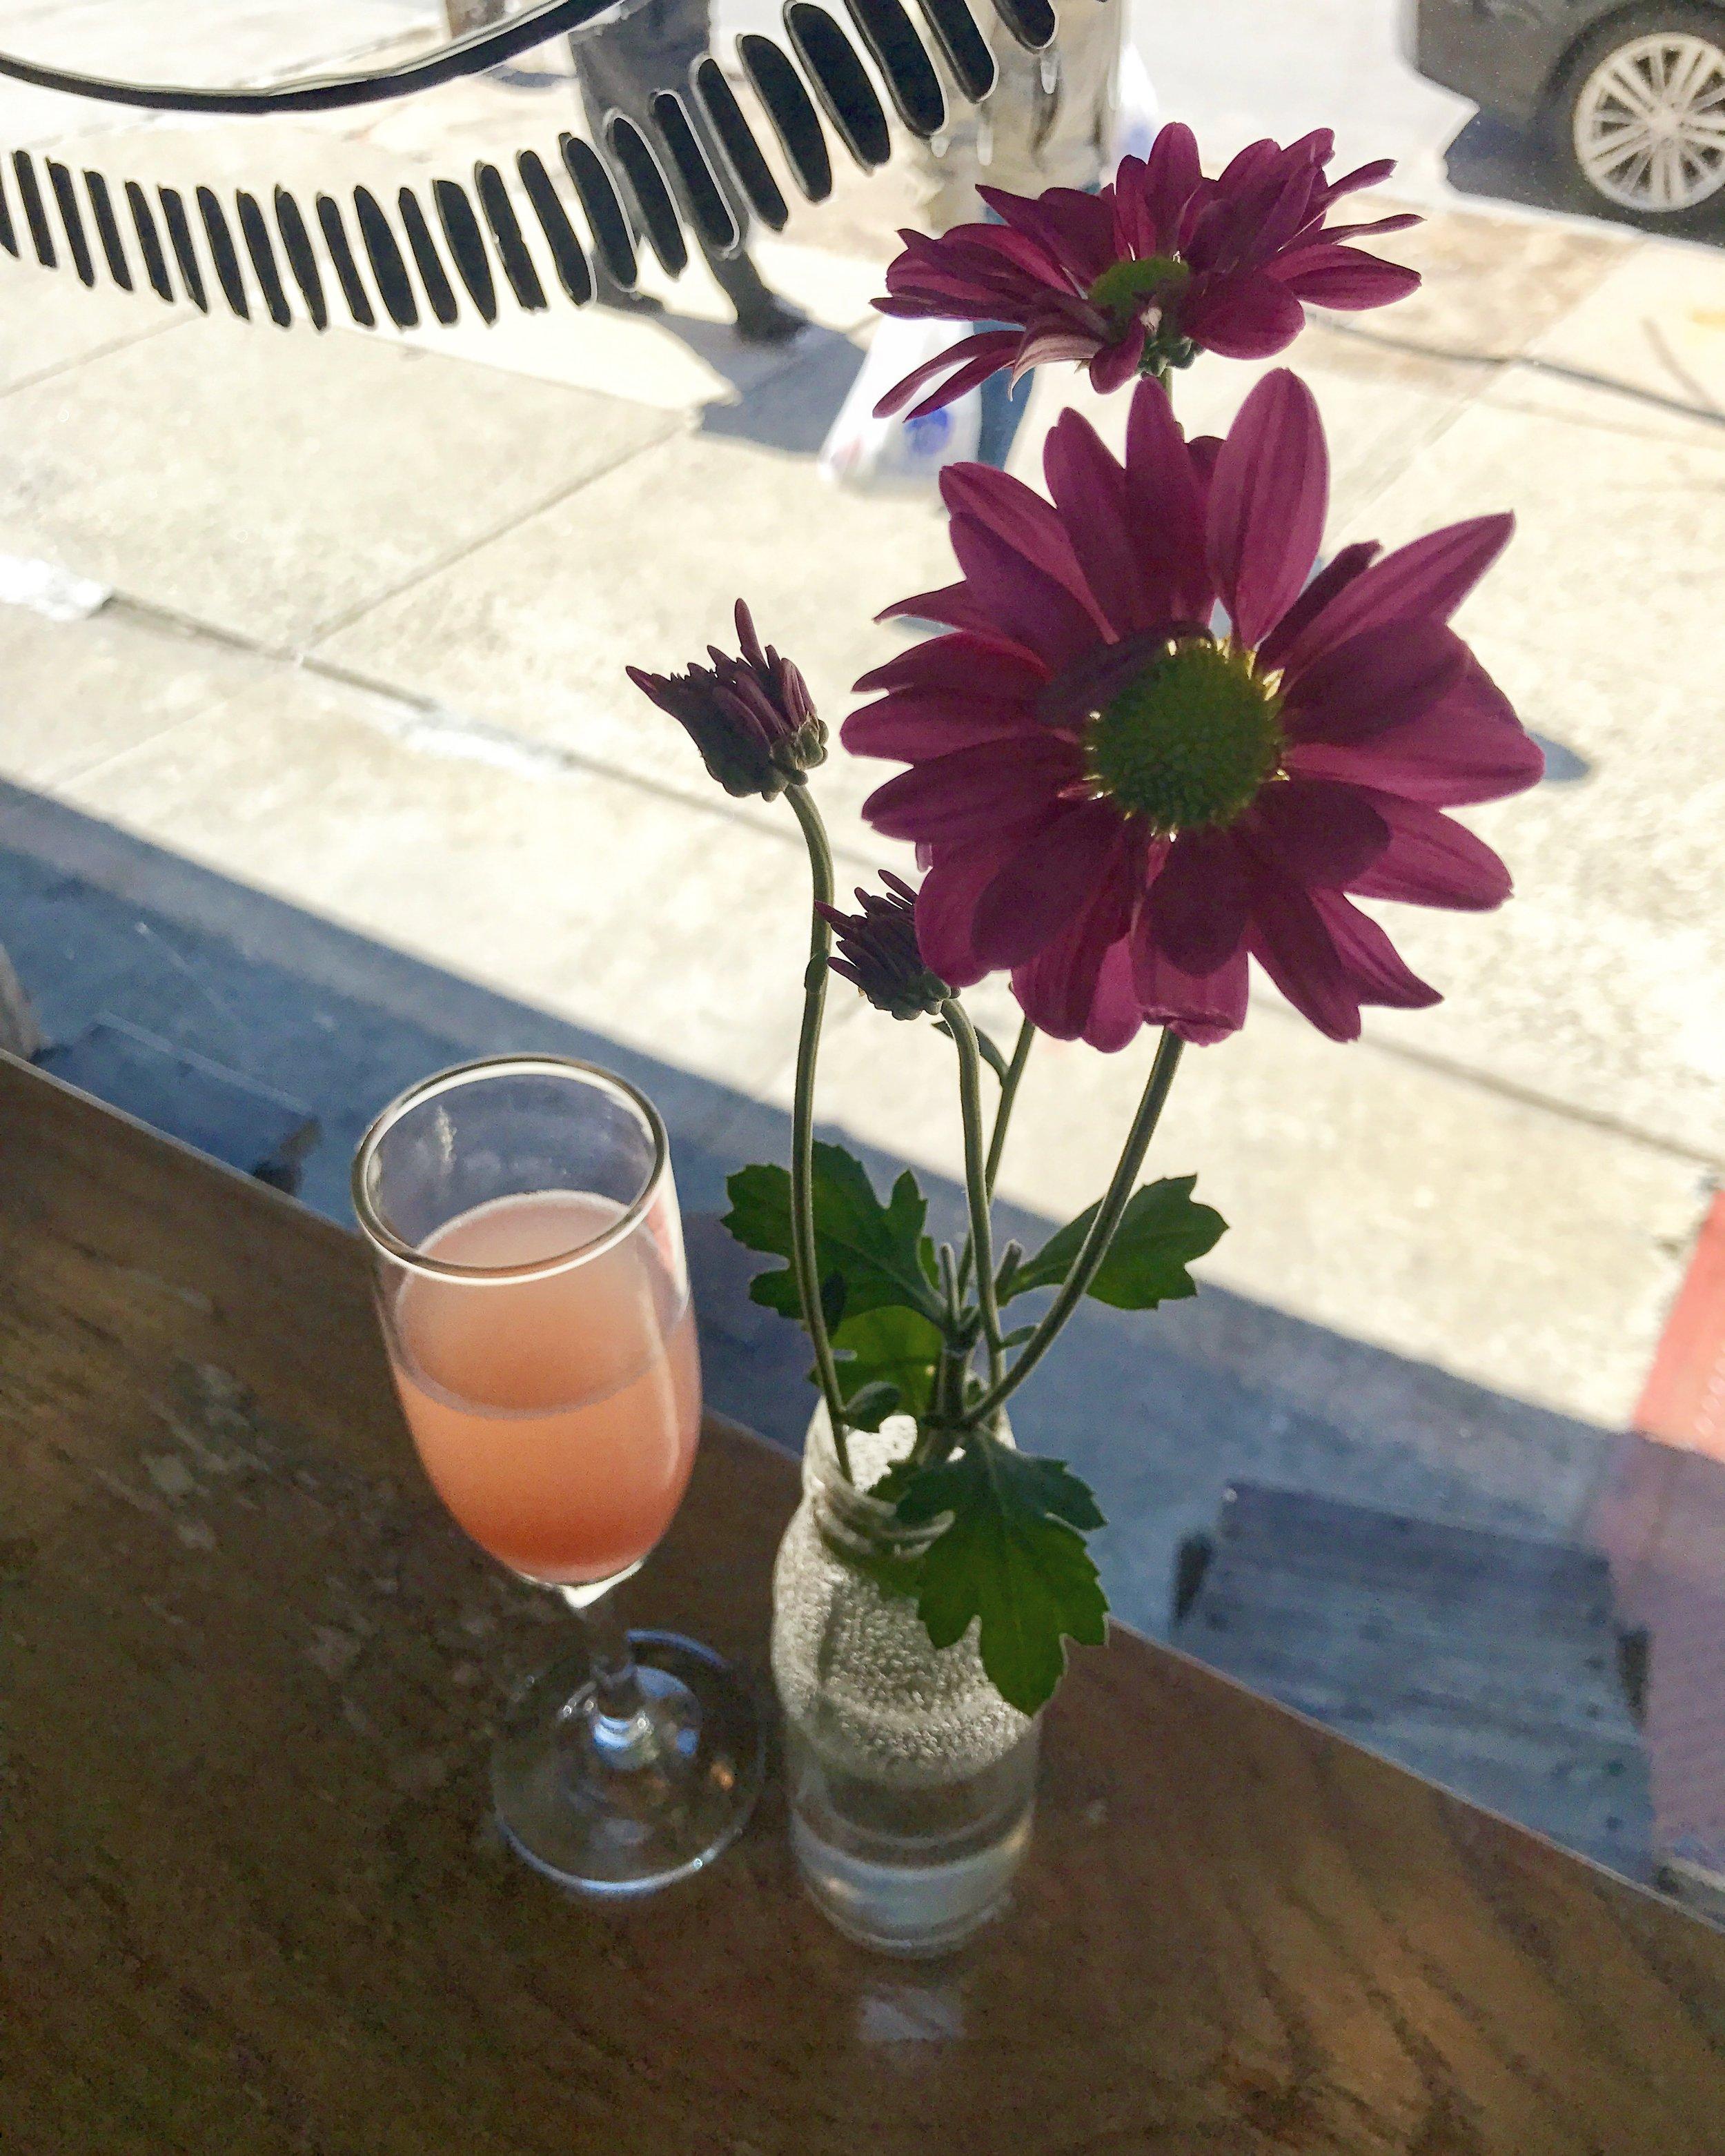 mimosa-flower-brooklyn-newyork-williamsburg-brunch-restaurant-local-organic-lunch-dinner-happy-hour-clo-cafe-guatemalan-spanish.jpg